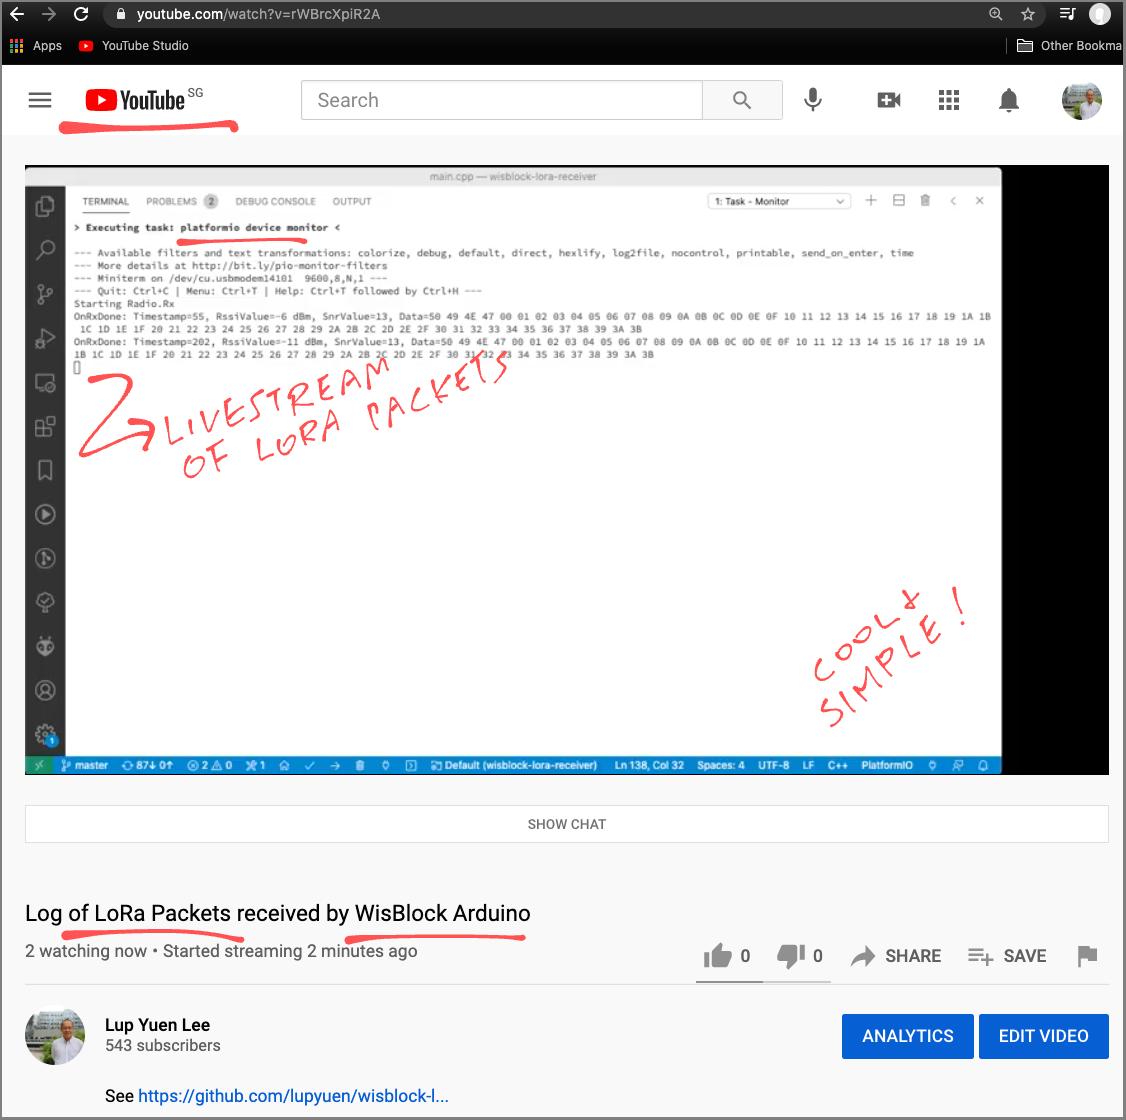 Livestream of WisBlock Arduino Log on YouTube